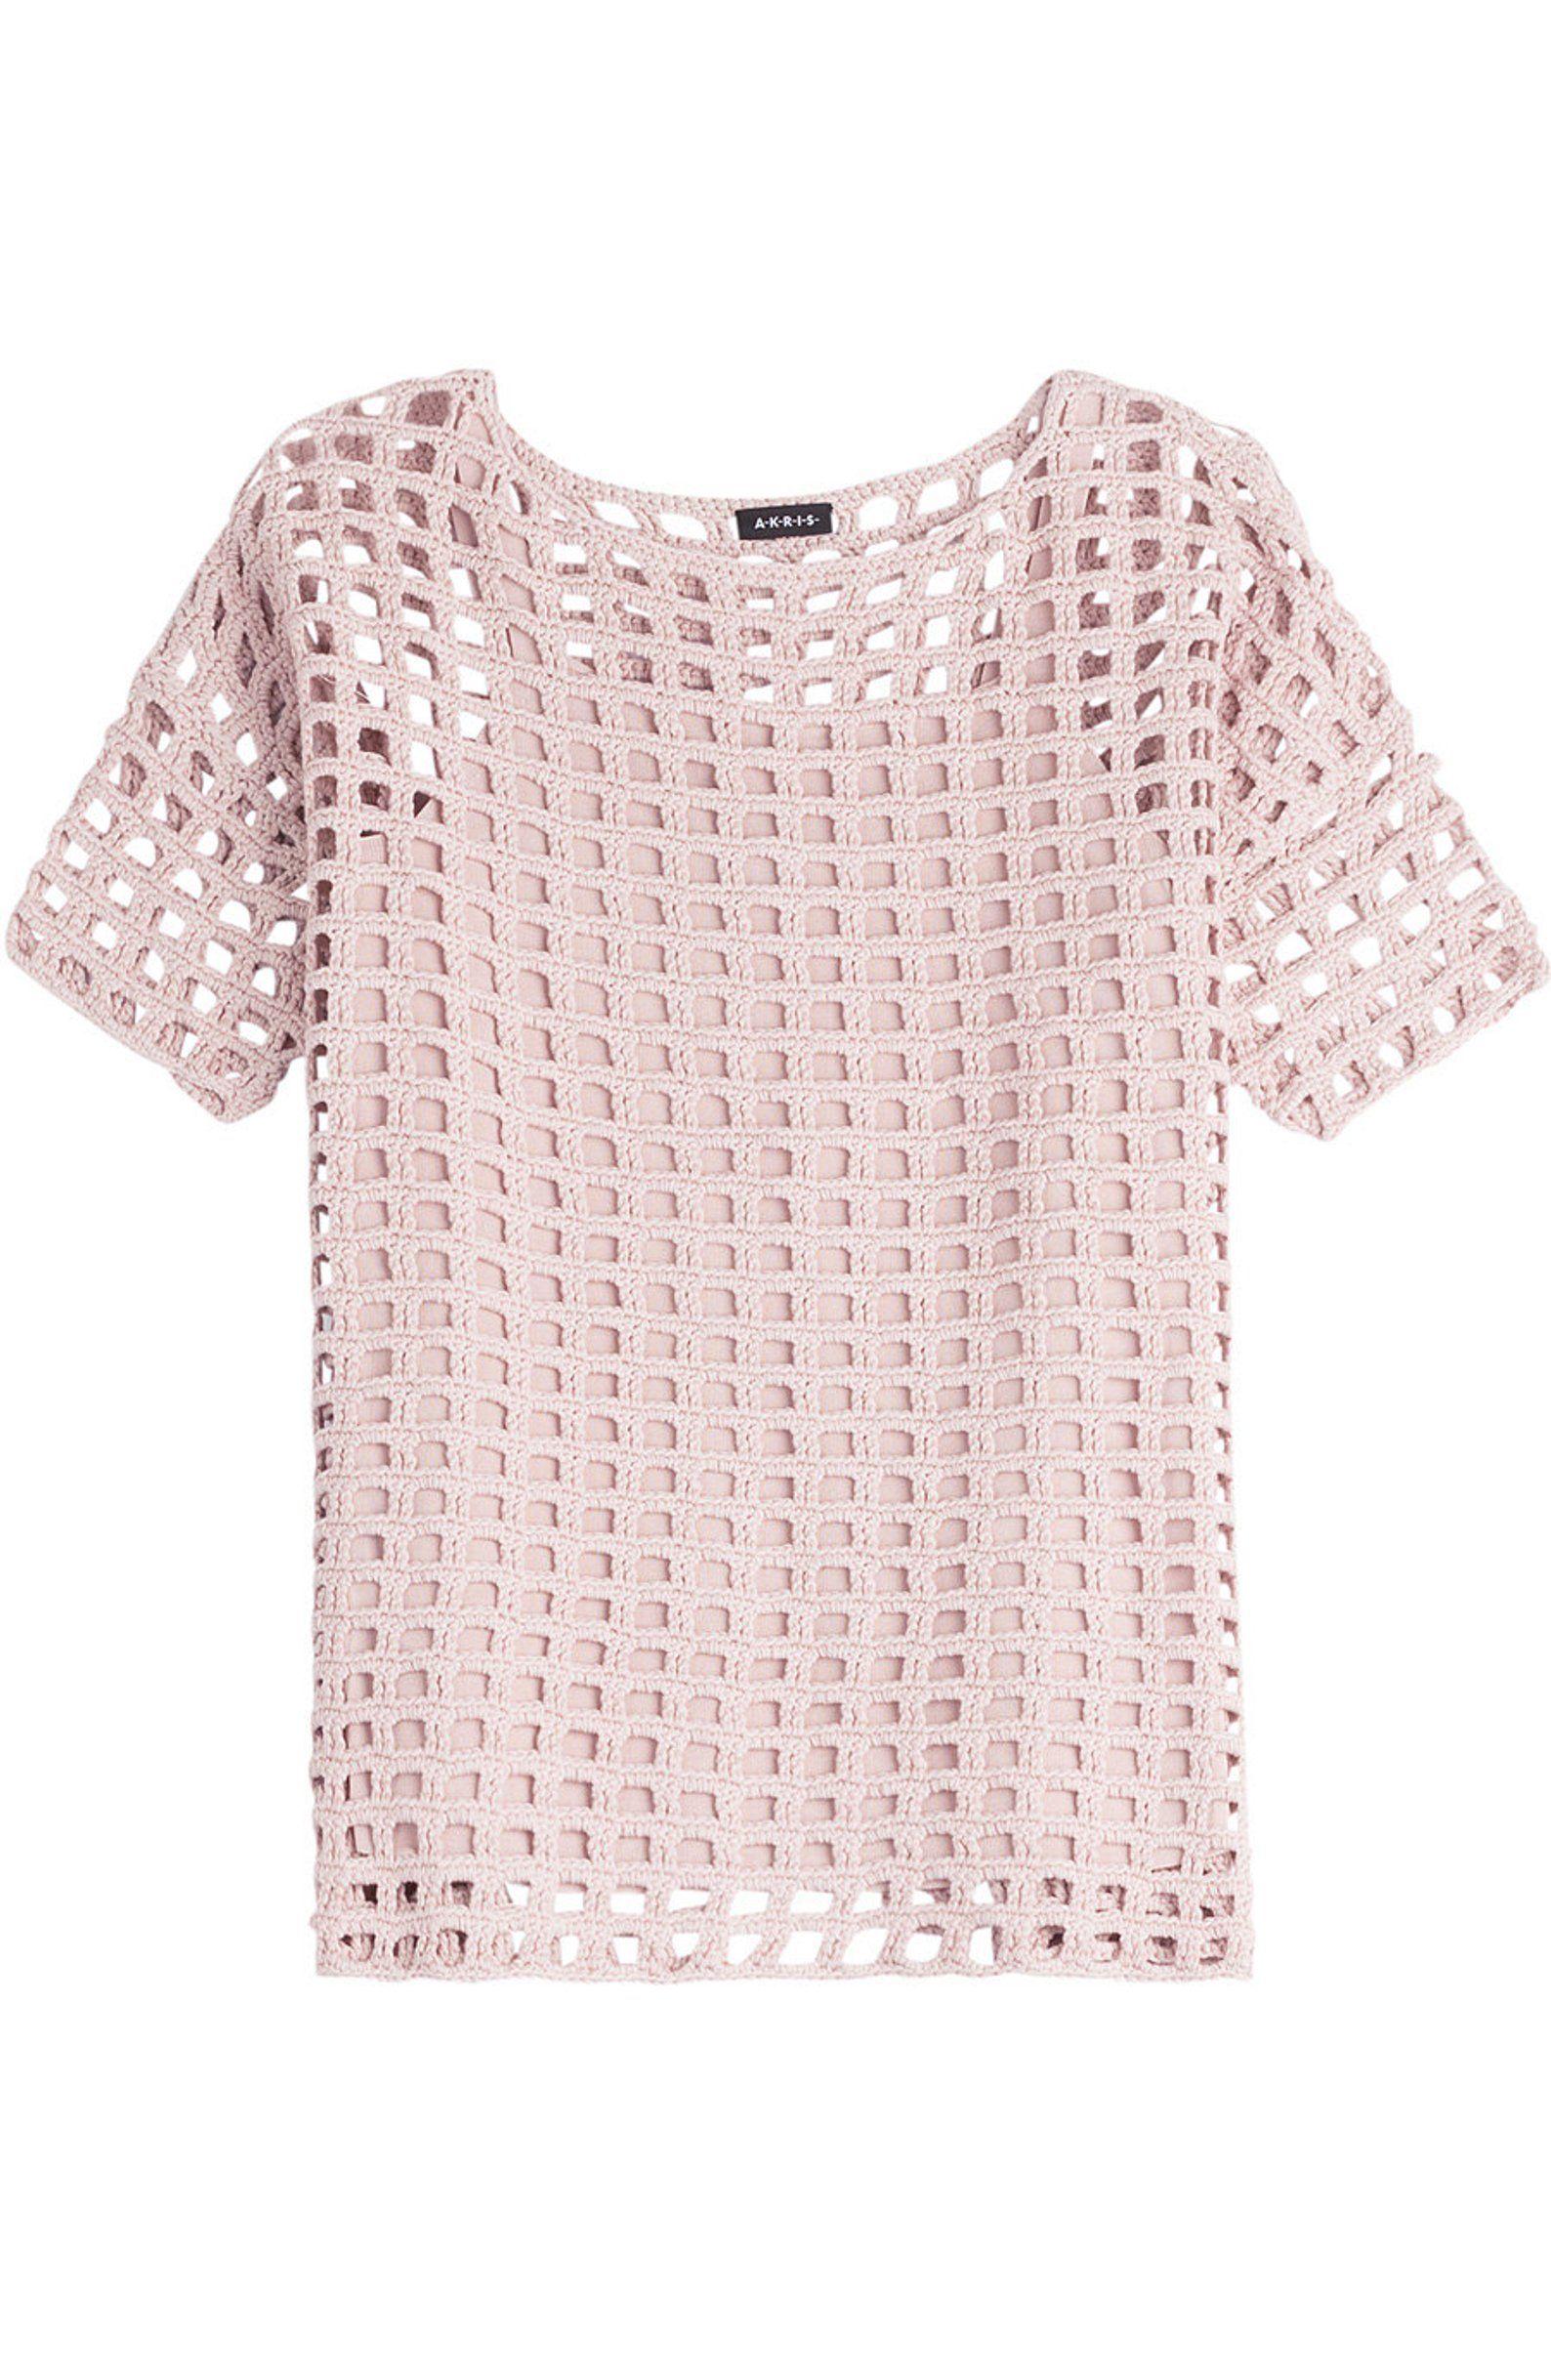 Beginner crochet pattern, crochet pattern for beginners